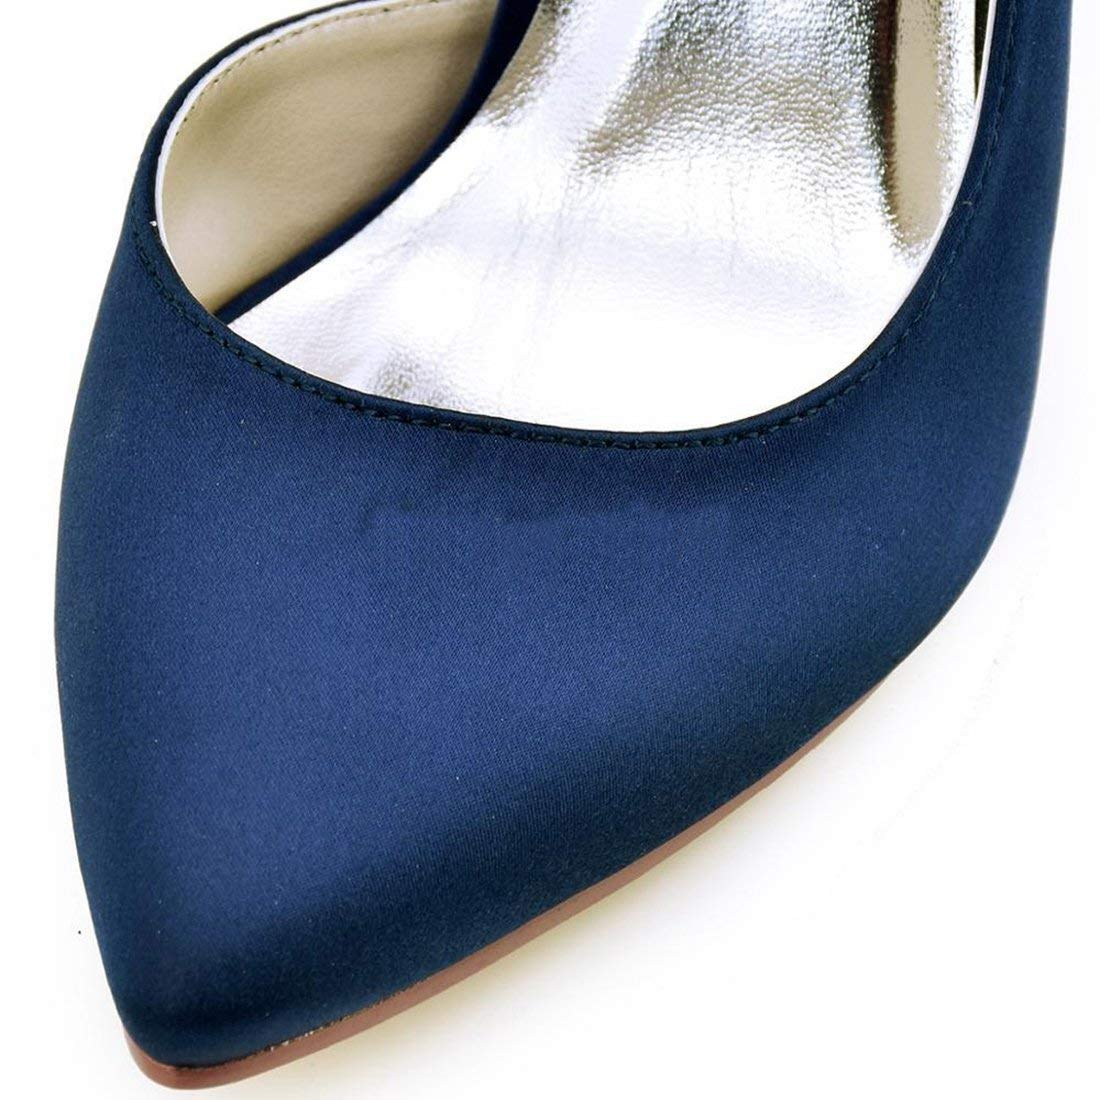 Qiusa Damen Mandel Toe D'Orsay D'Orsay D'Orsay Marineblau Satin Braut Hochzeit Formelle Partei Schuhe UK 2 (Farbe   - Größe   -) a5c527